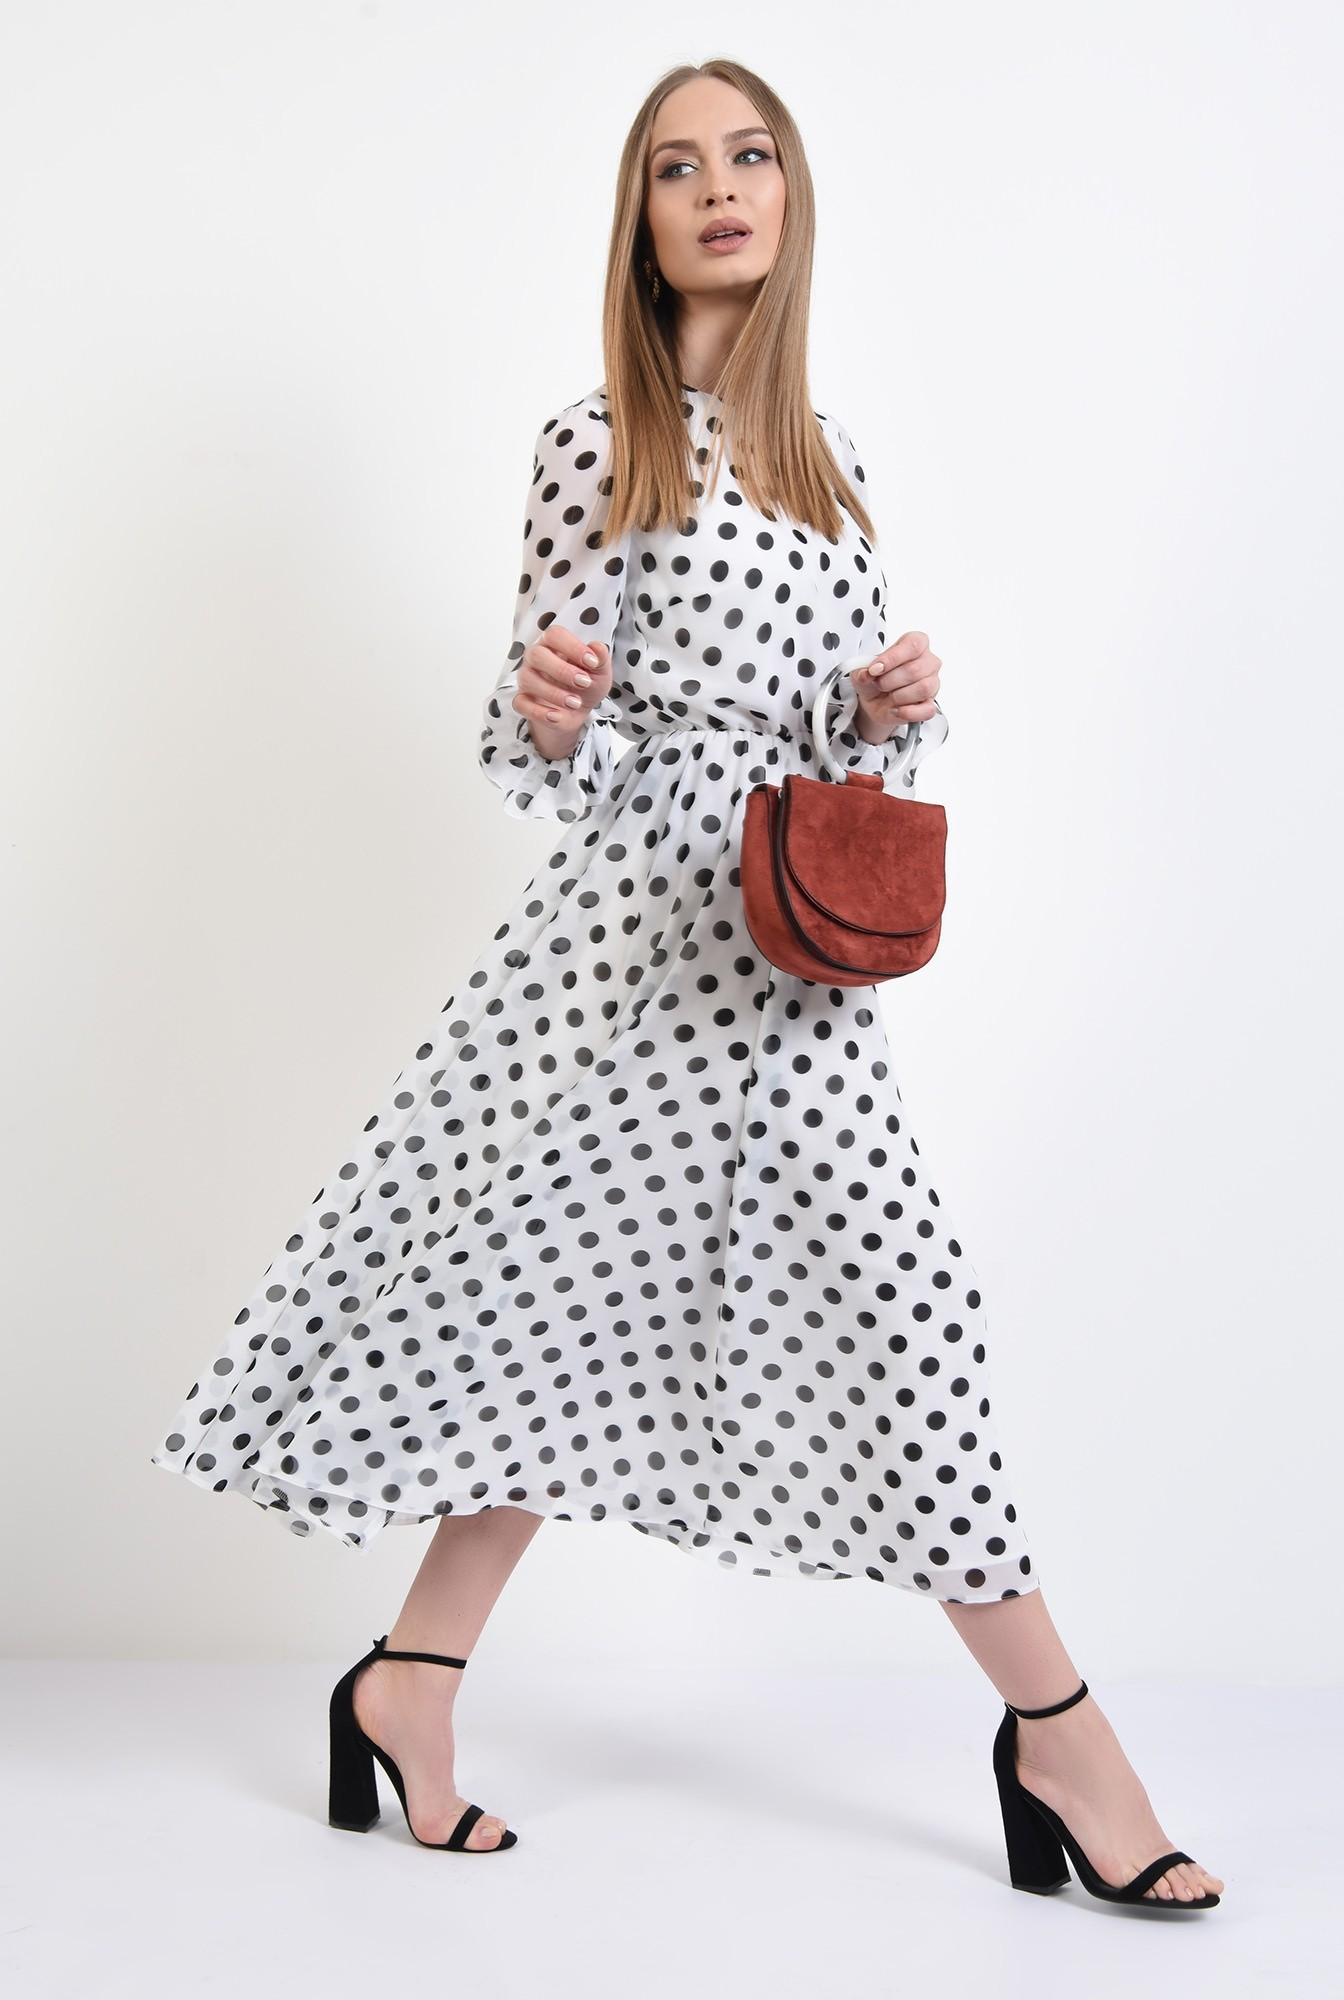 3 - 360 - rochie lunga, clos, cu buline, alb-negru, mansete volan, Poema